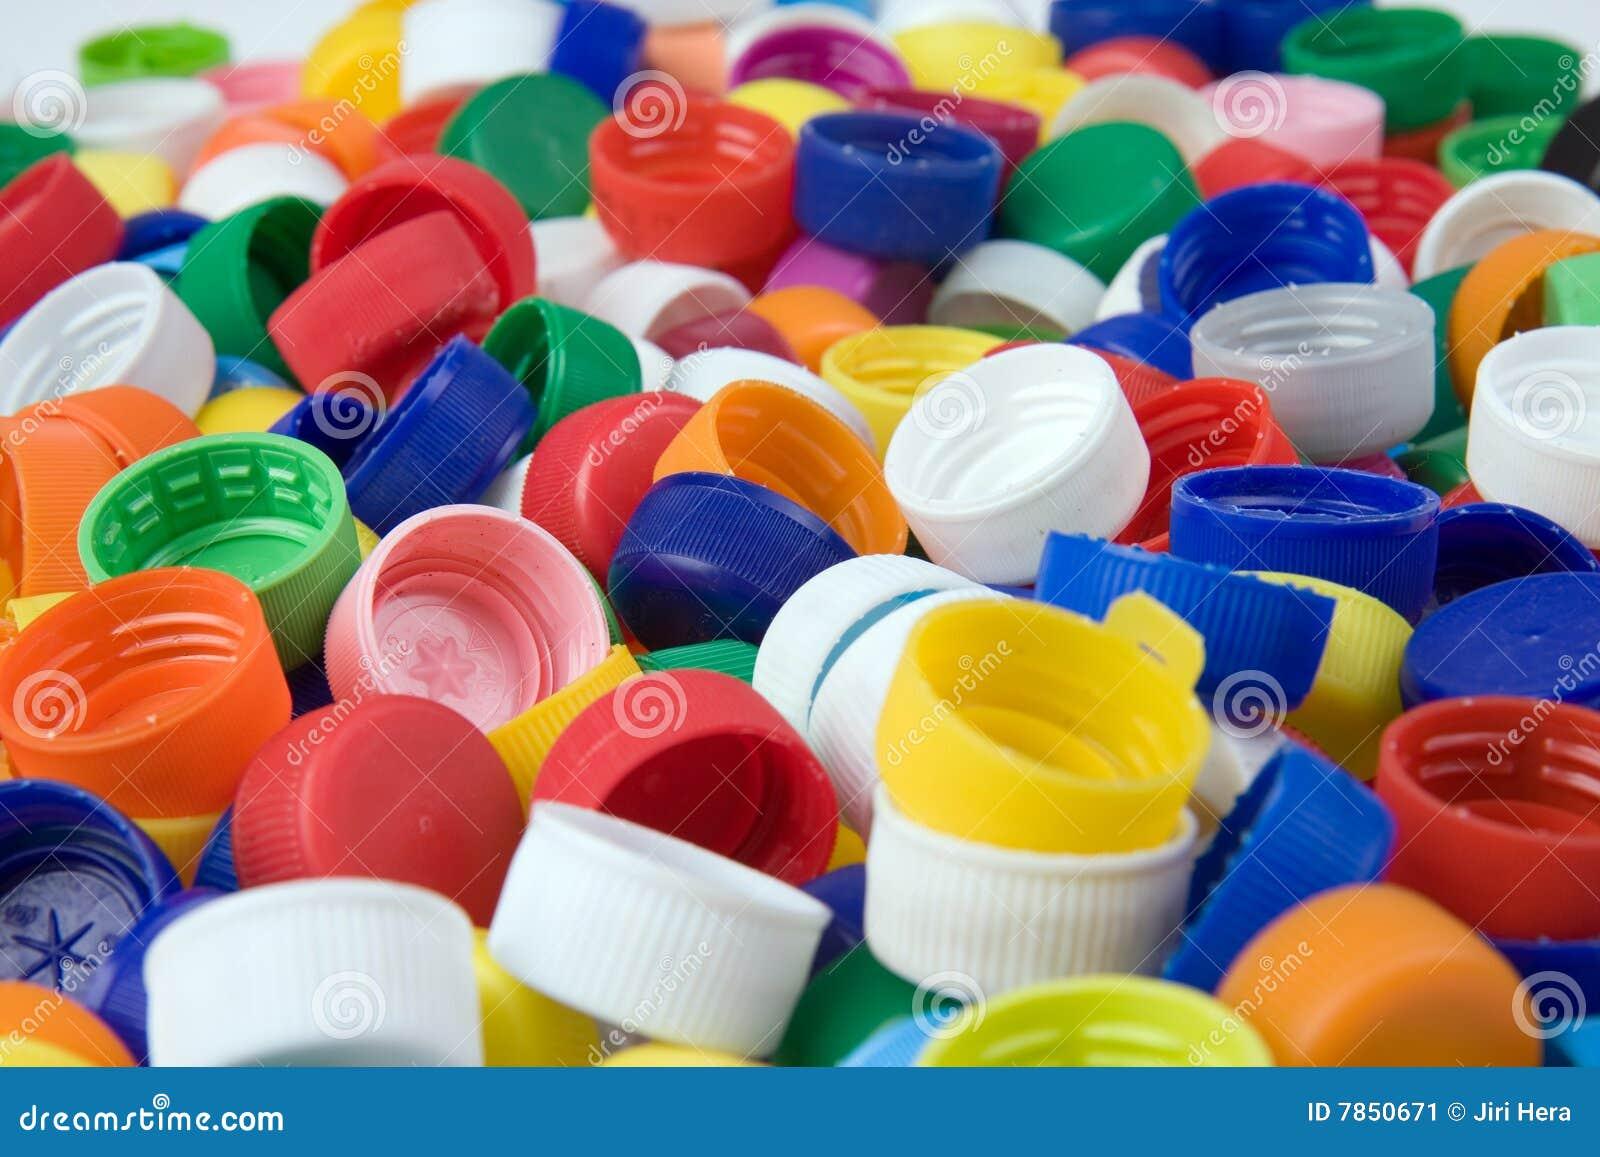 Plastic bottle caps stock image image 7850671 - Plastic bottles with caps ...